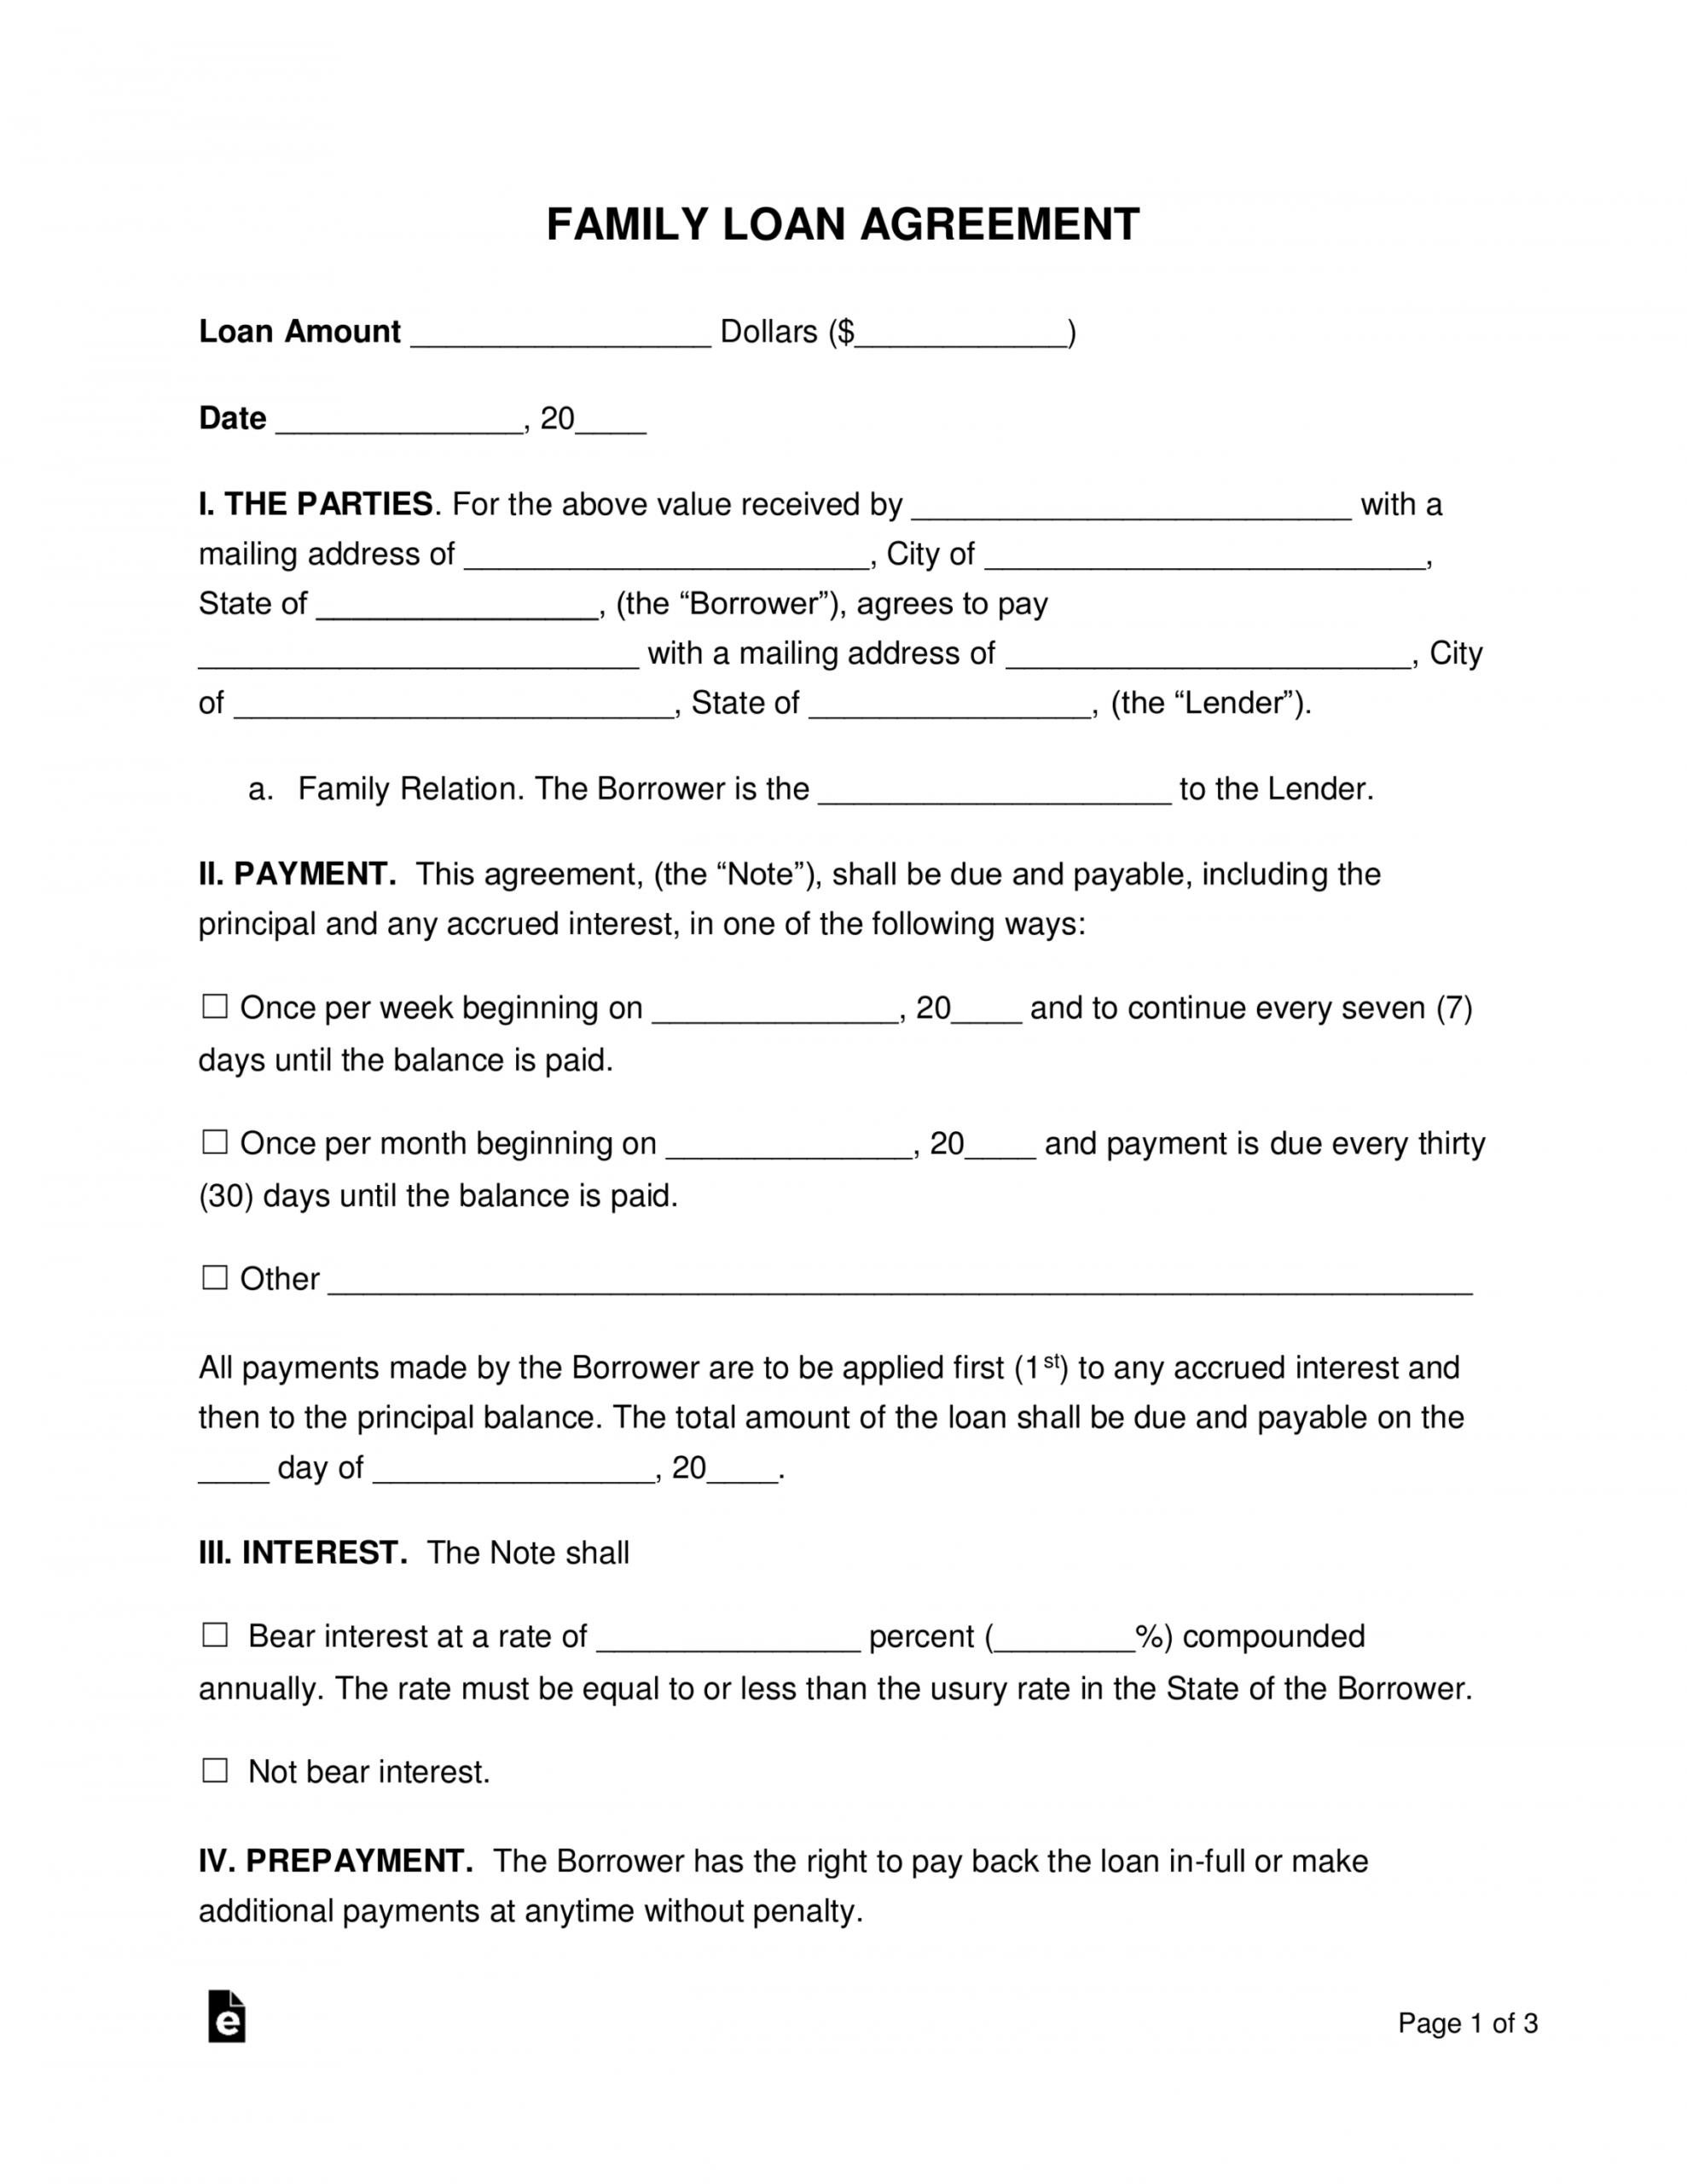 free family loan agreement template  pdf  word  eforms australian promissory note template pdf